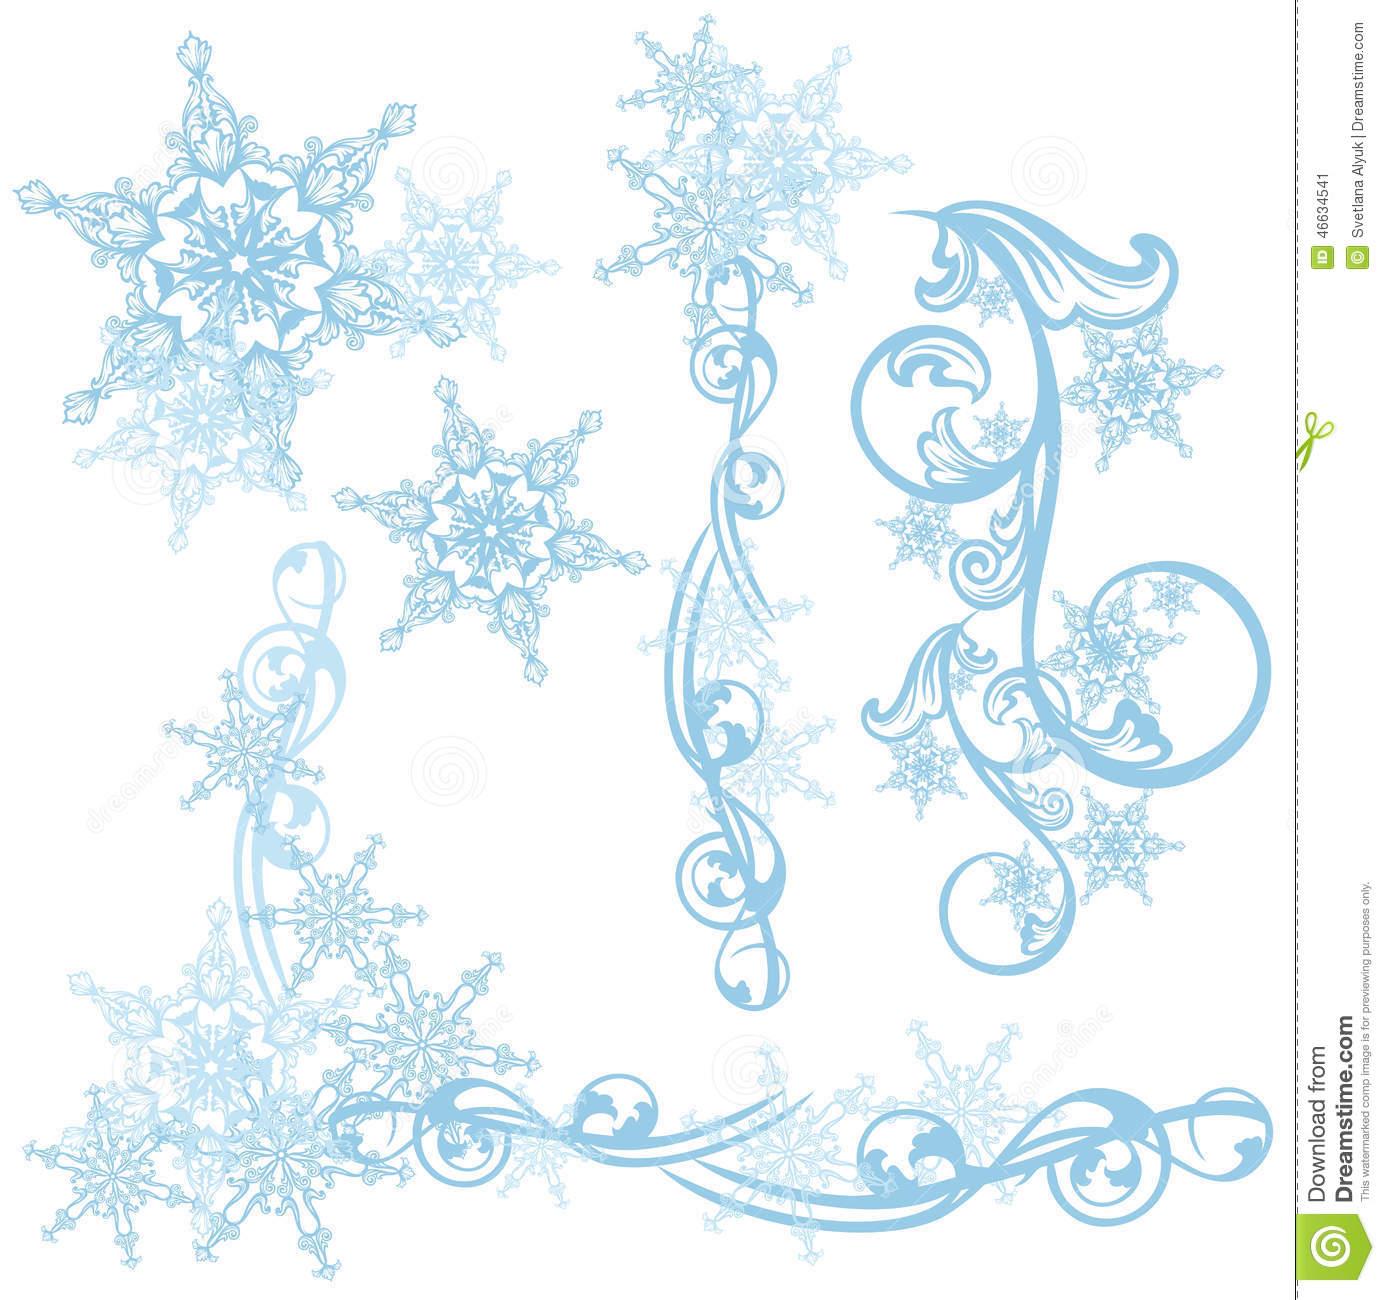 Snow Design Elements Stock Vector.